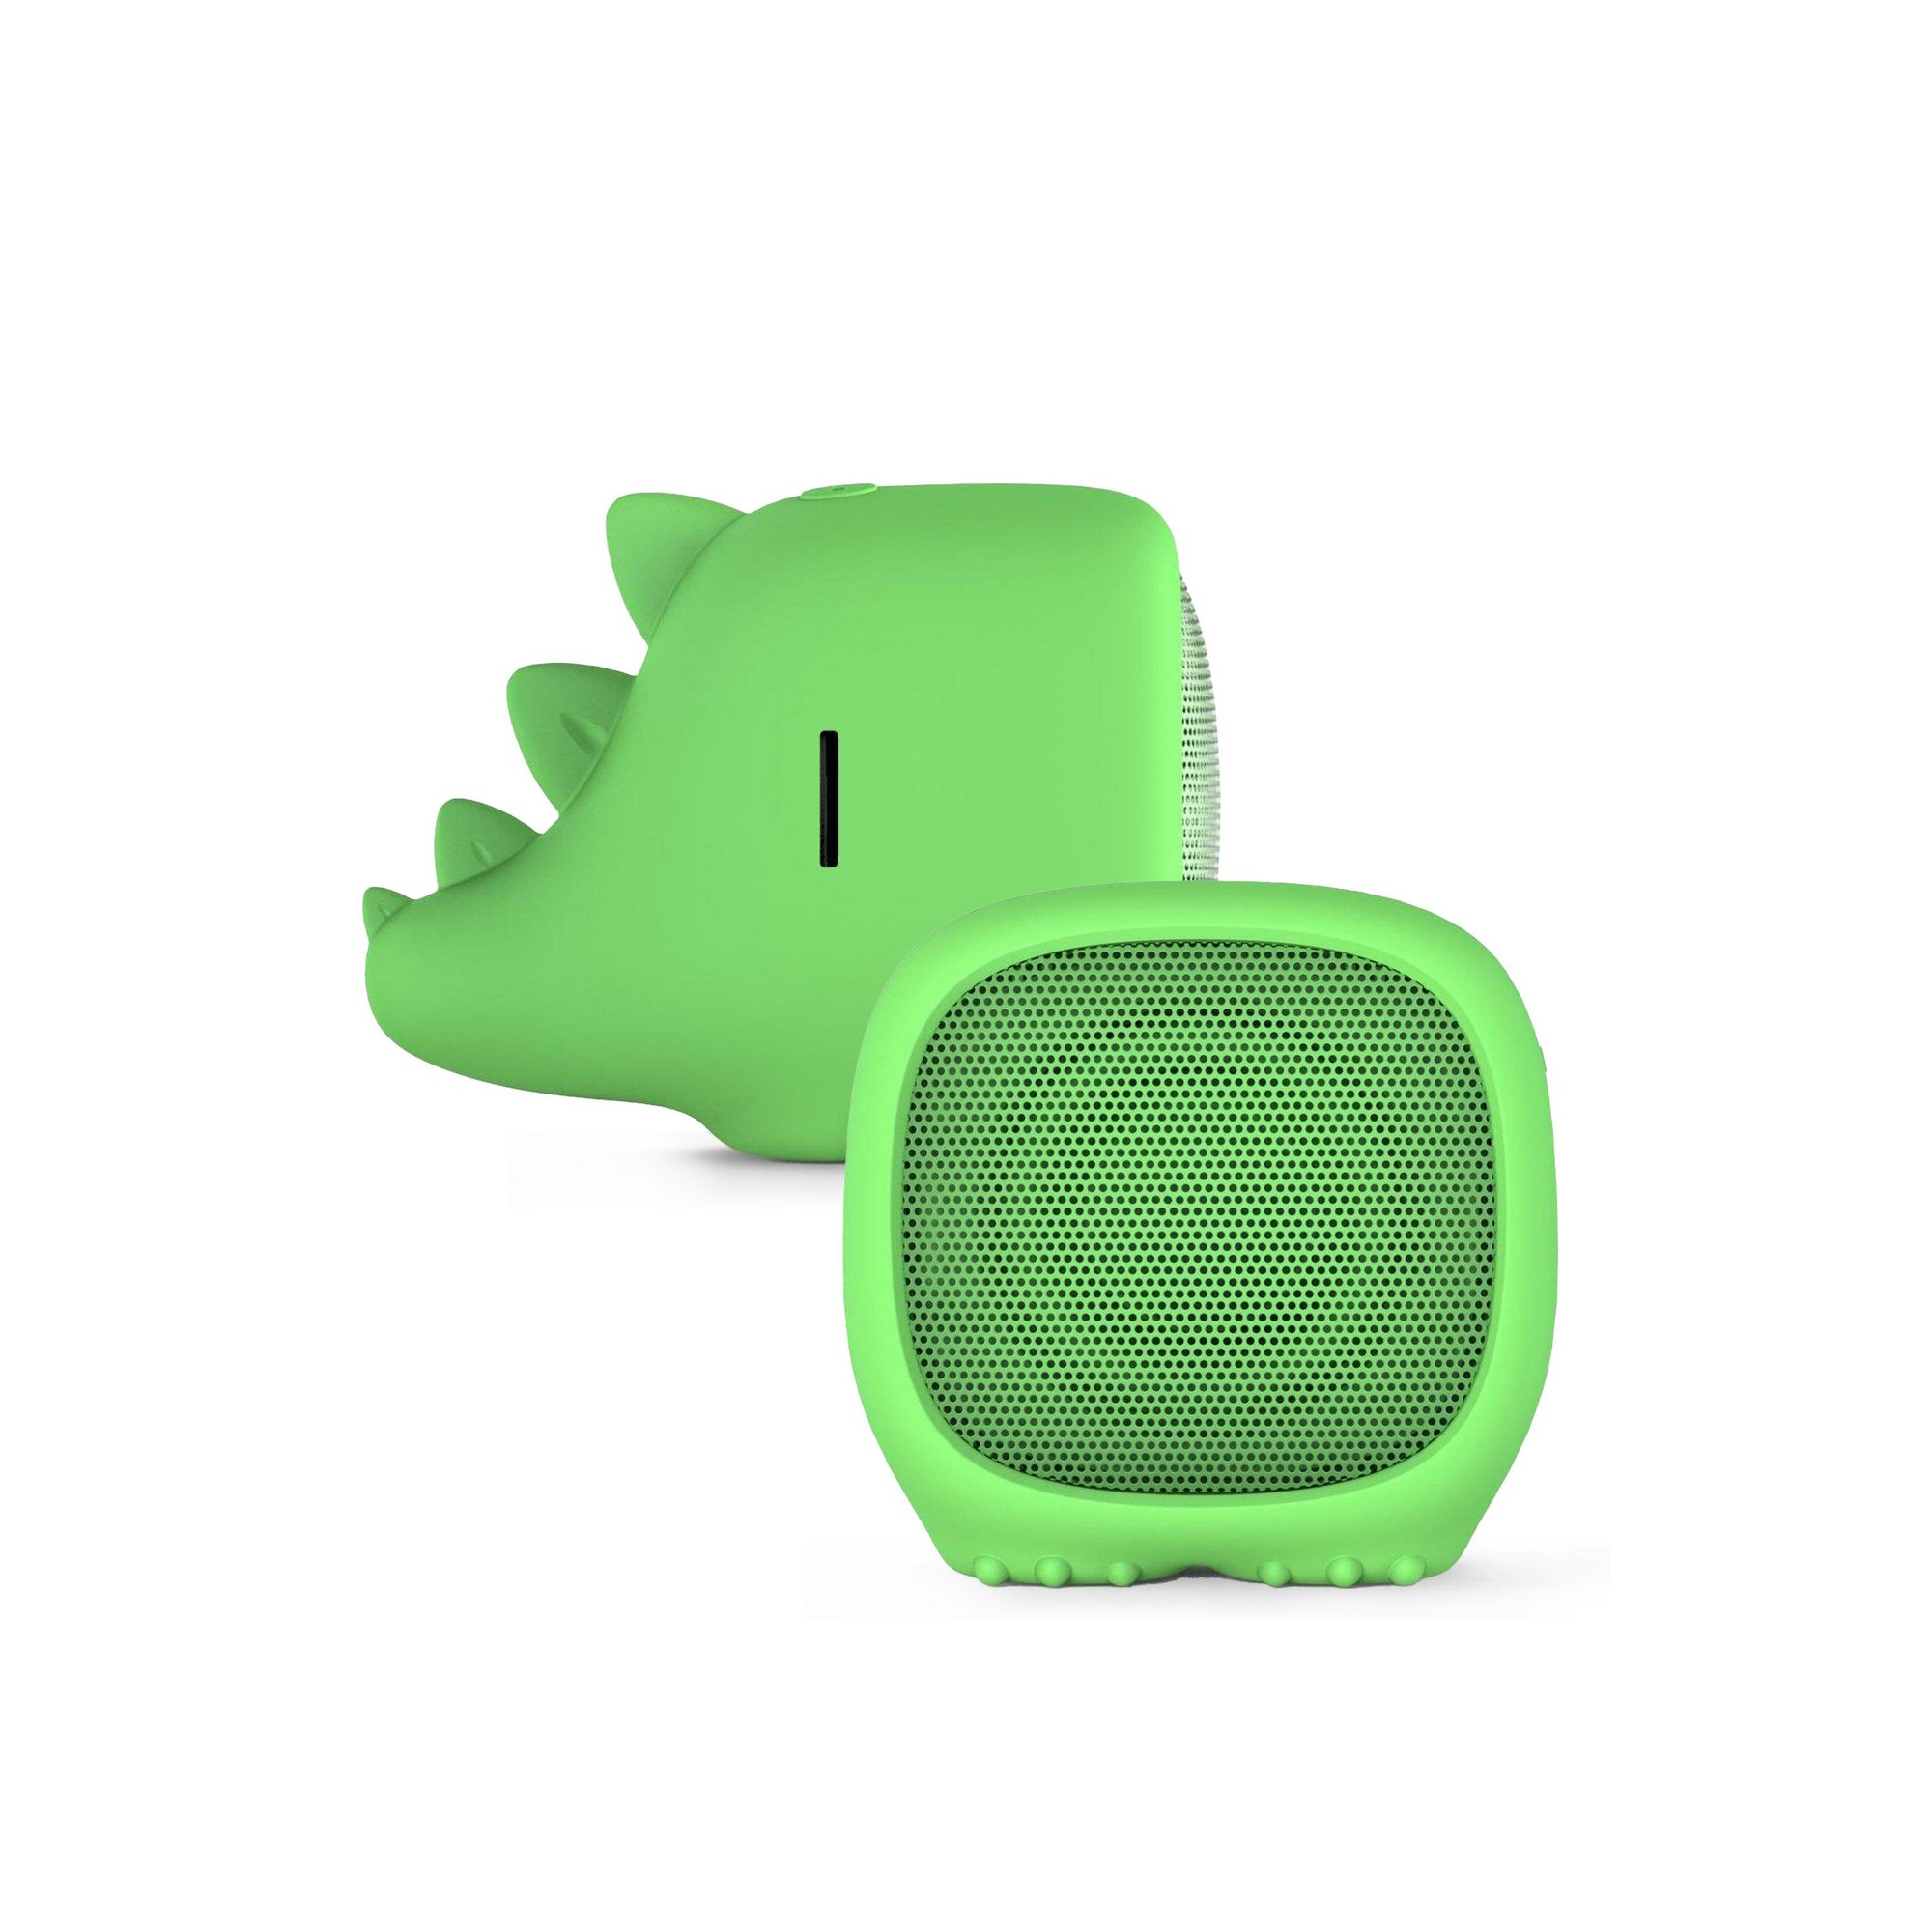 Image of KitSound Boogie Buddy Portable Bluetooth Speaker